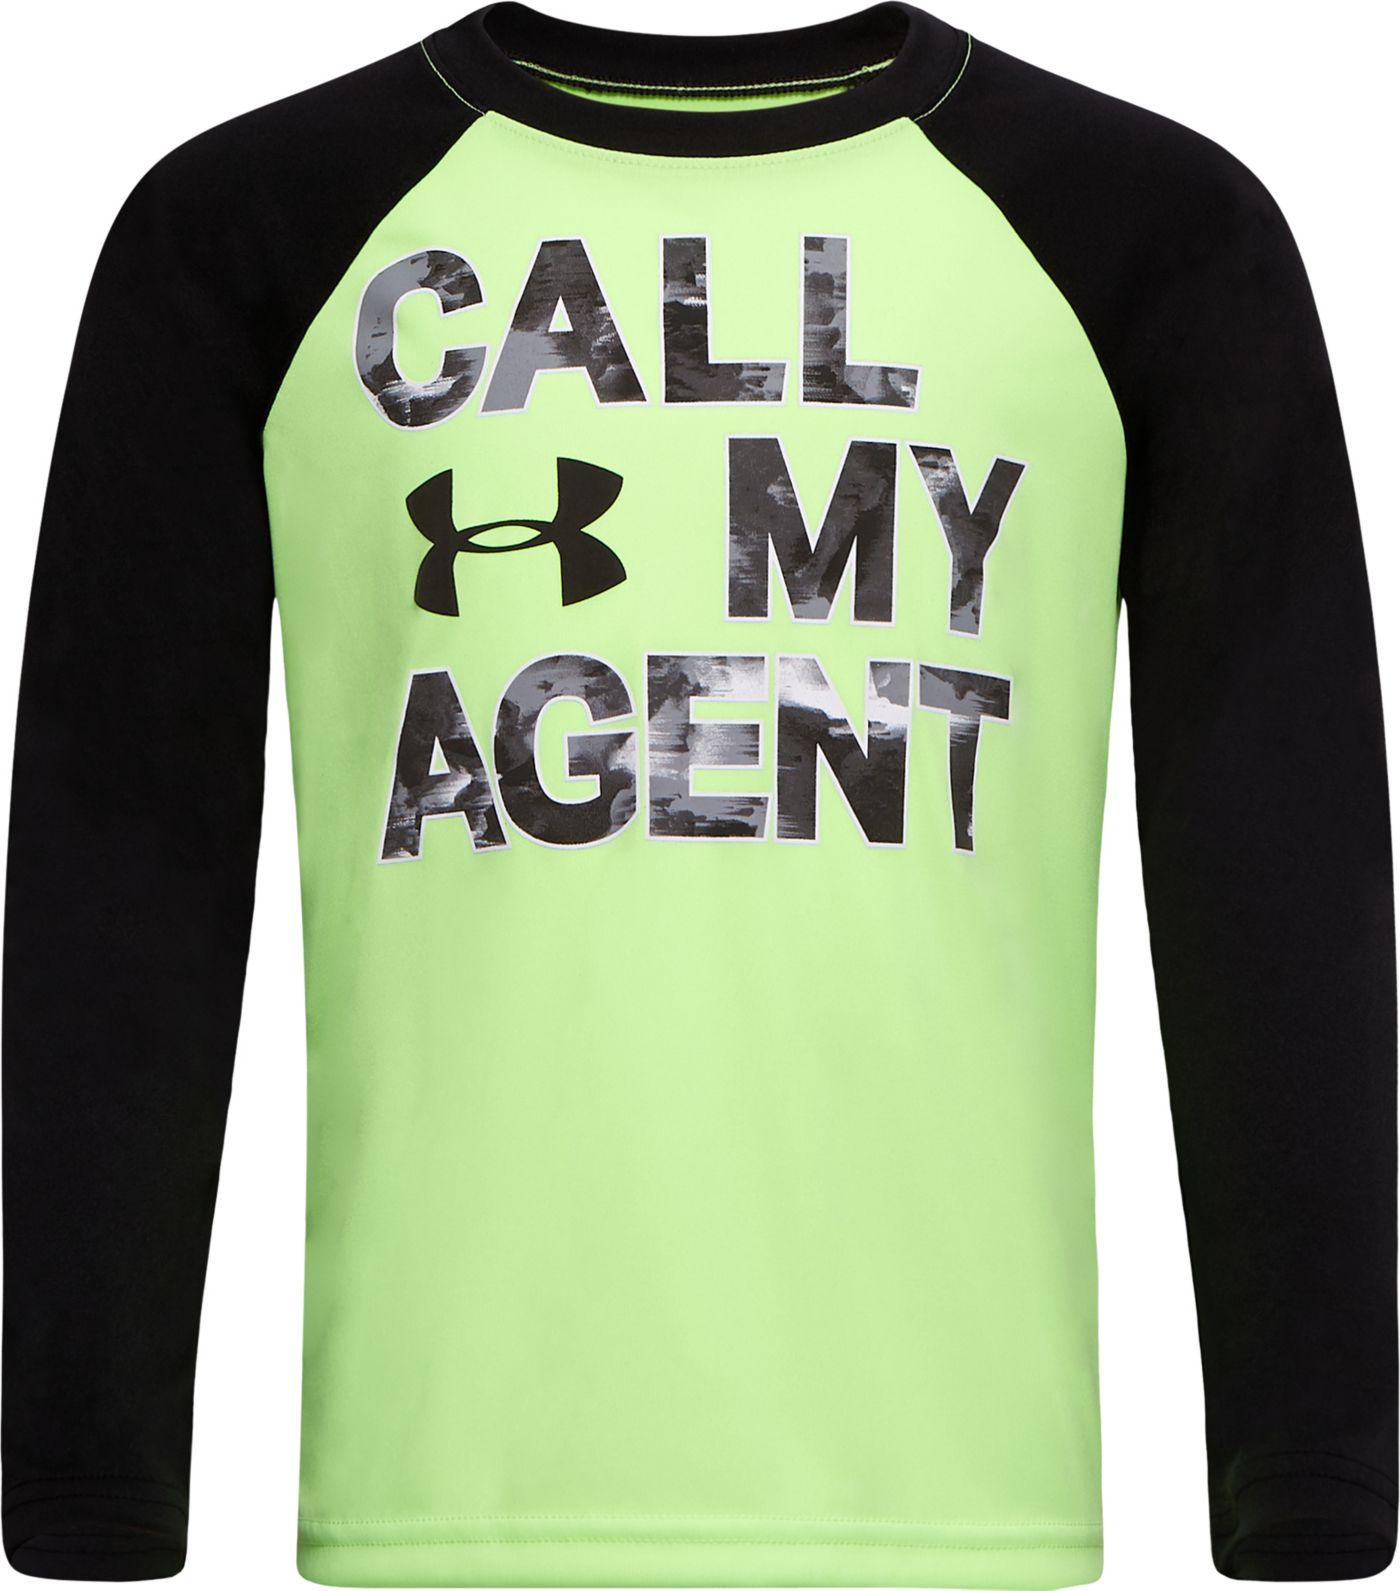 Under Armour Little Boys' Call My Agent Raglan Long Sleeve Shirt